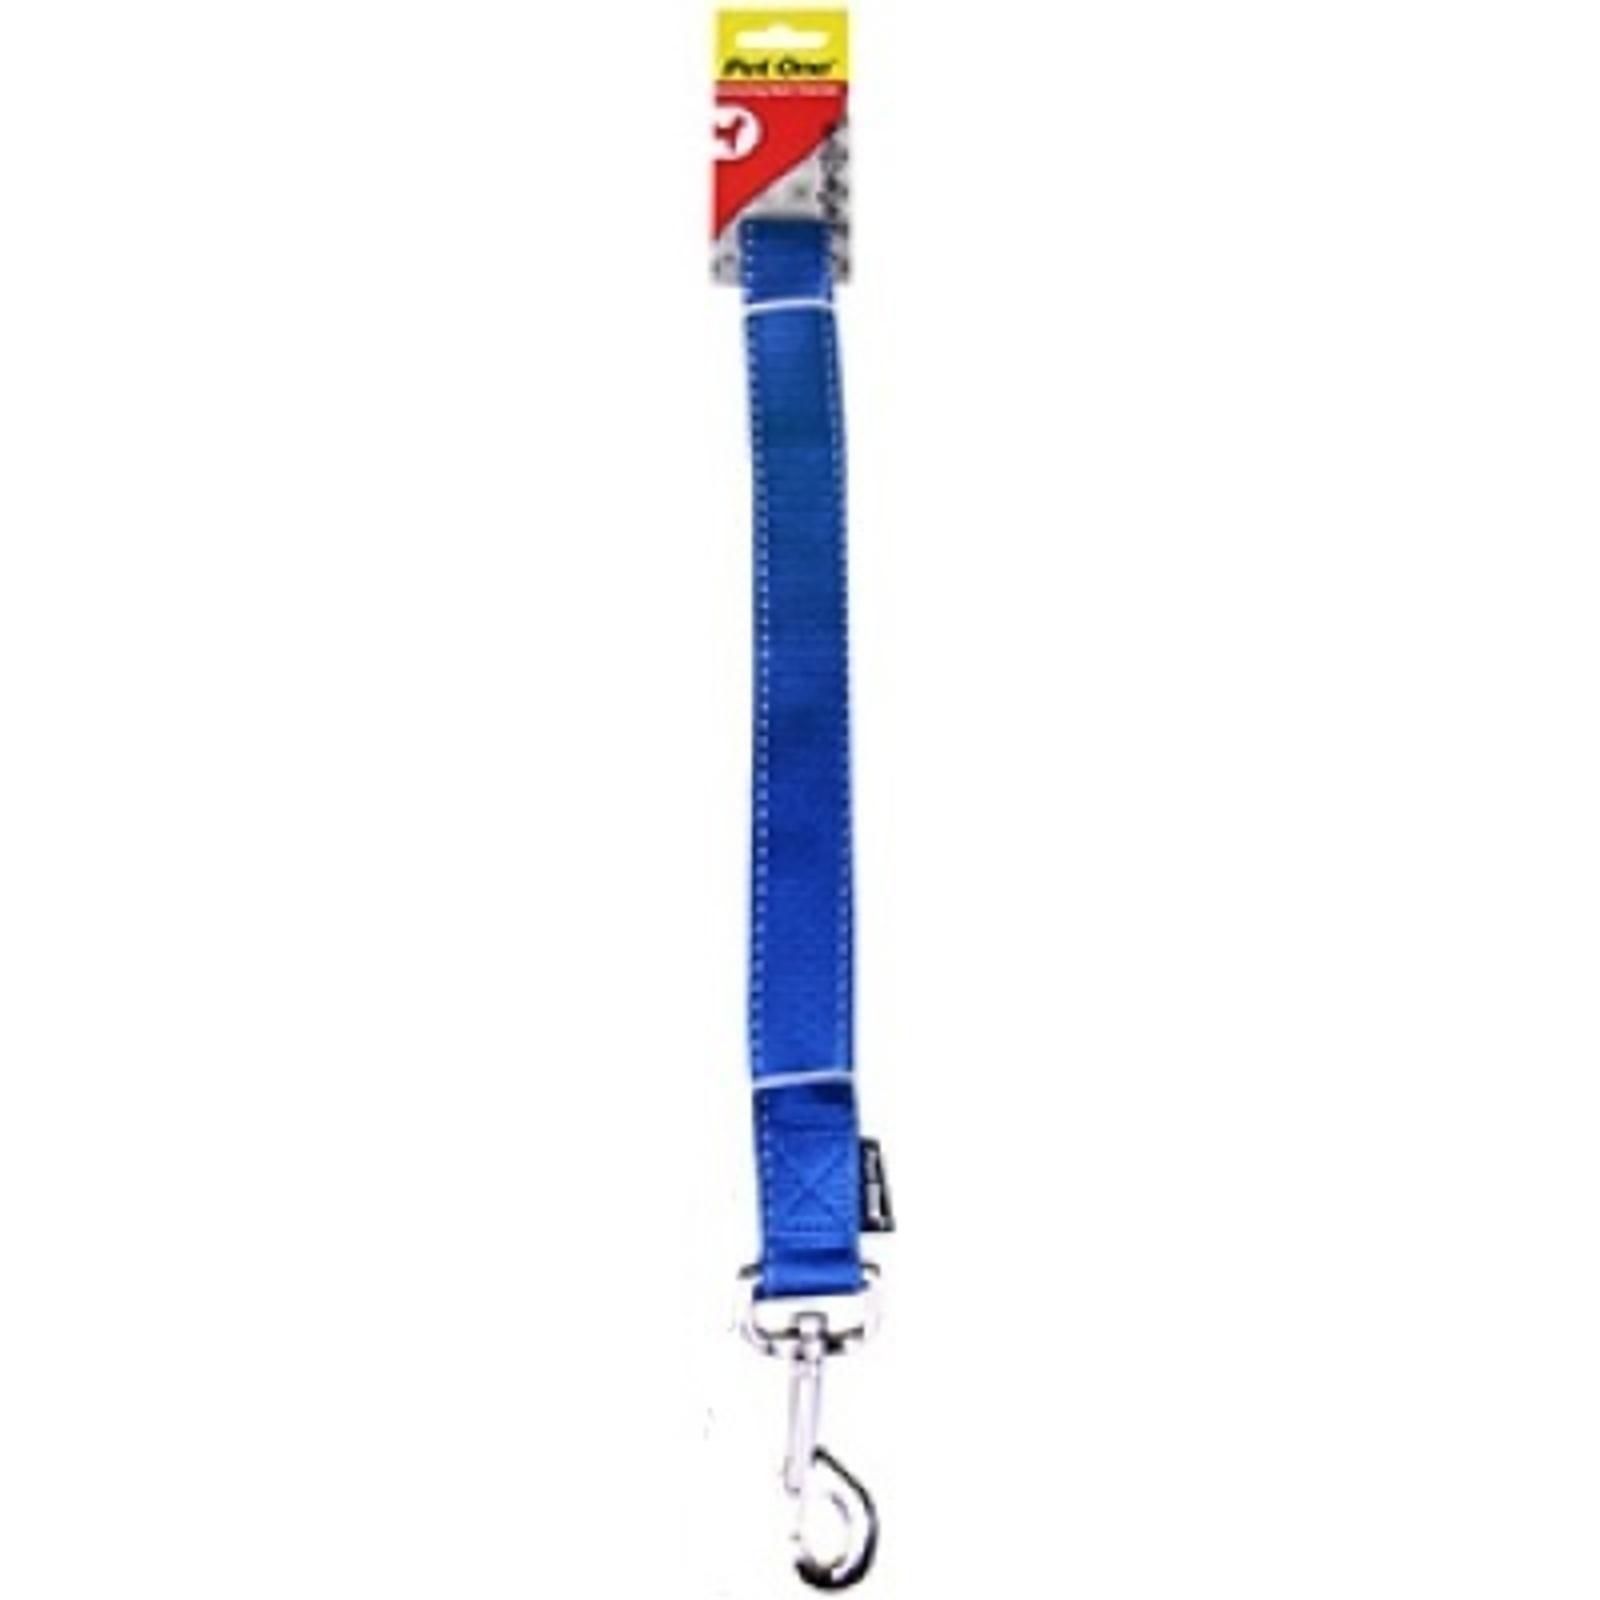 Dog Leash Lead Reflective Nylon - Blue - 15mm x 150cm (Pet One)